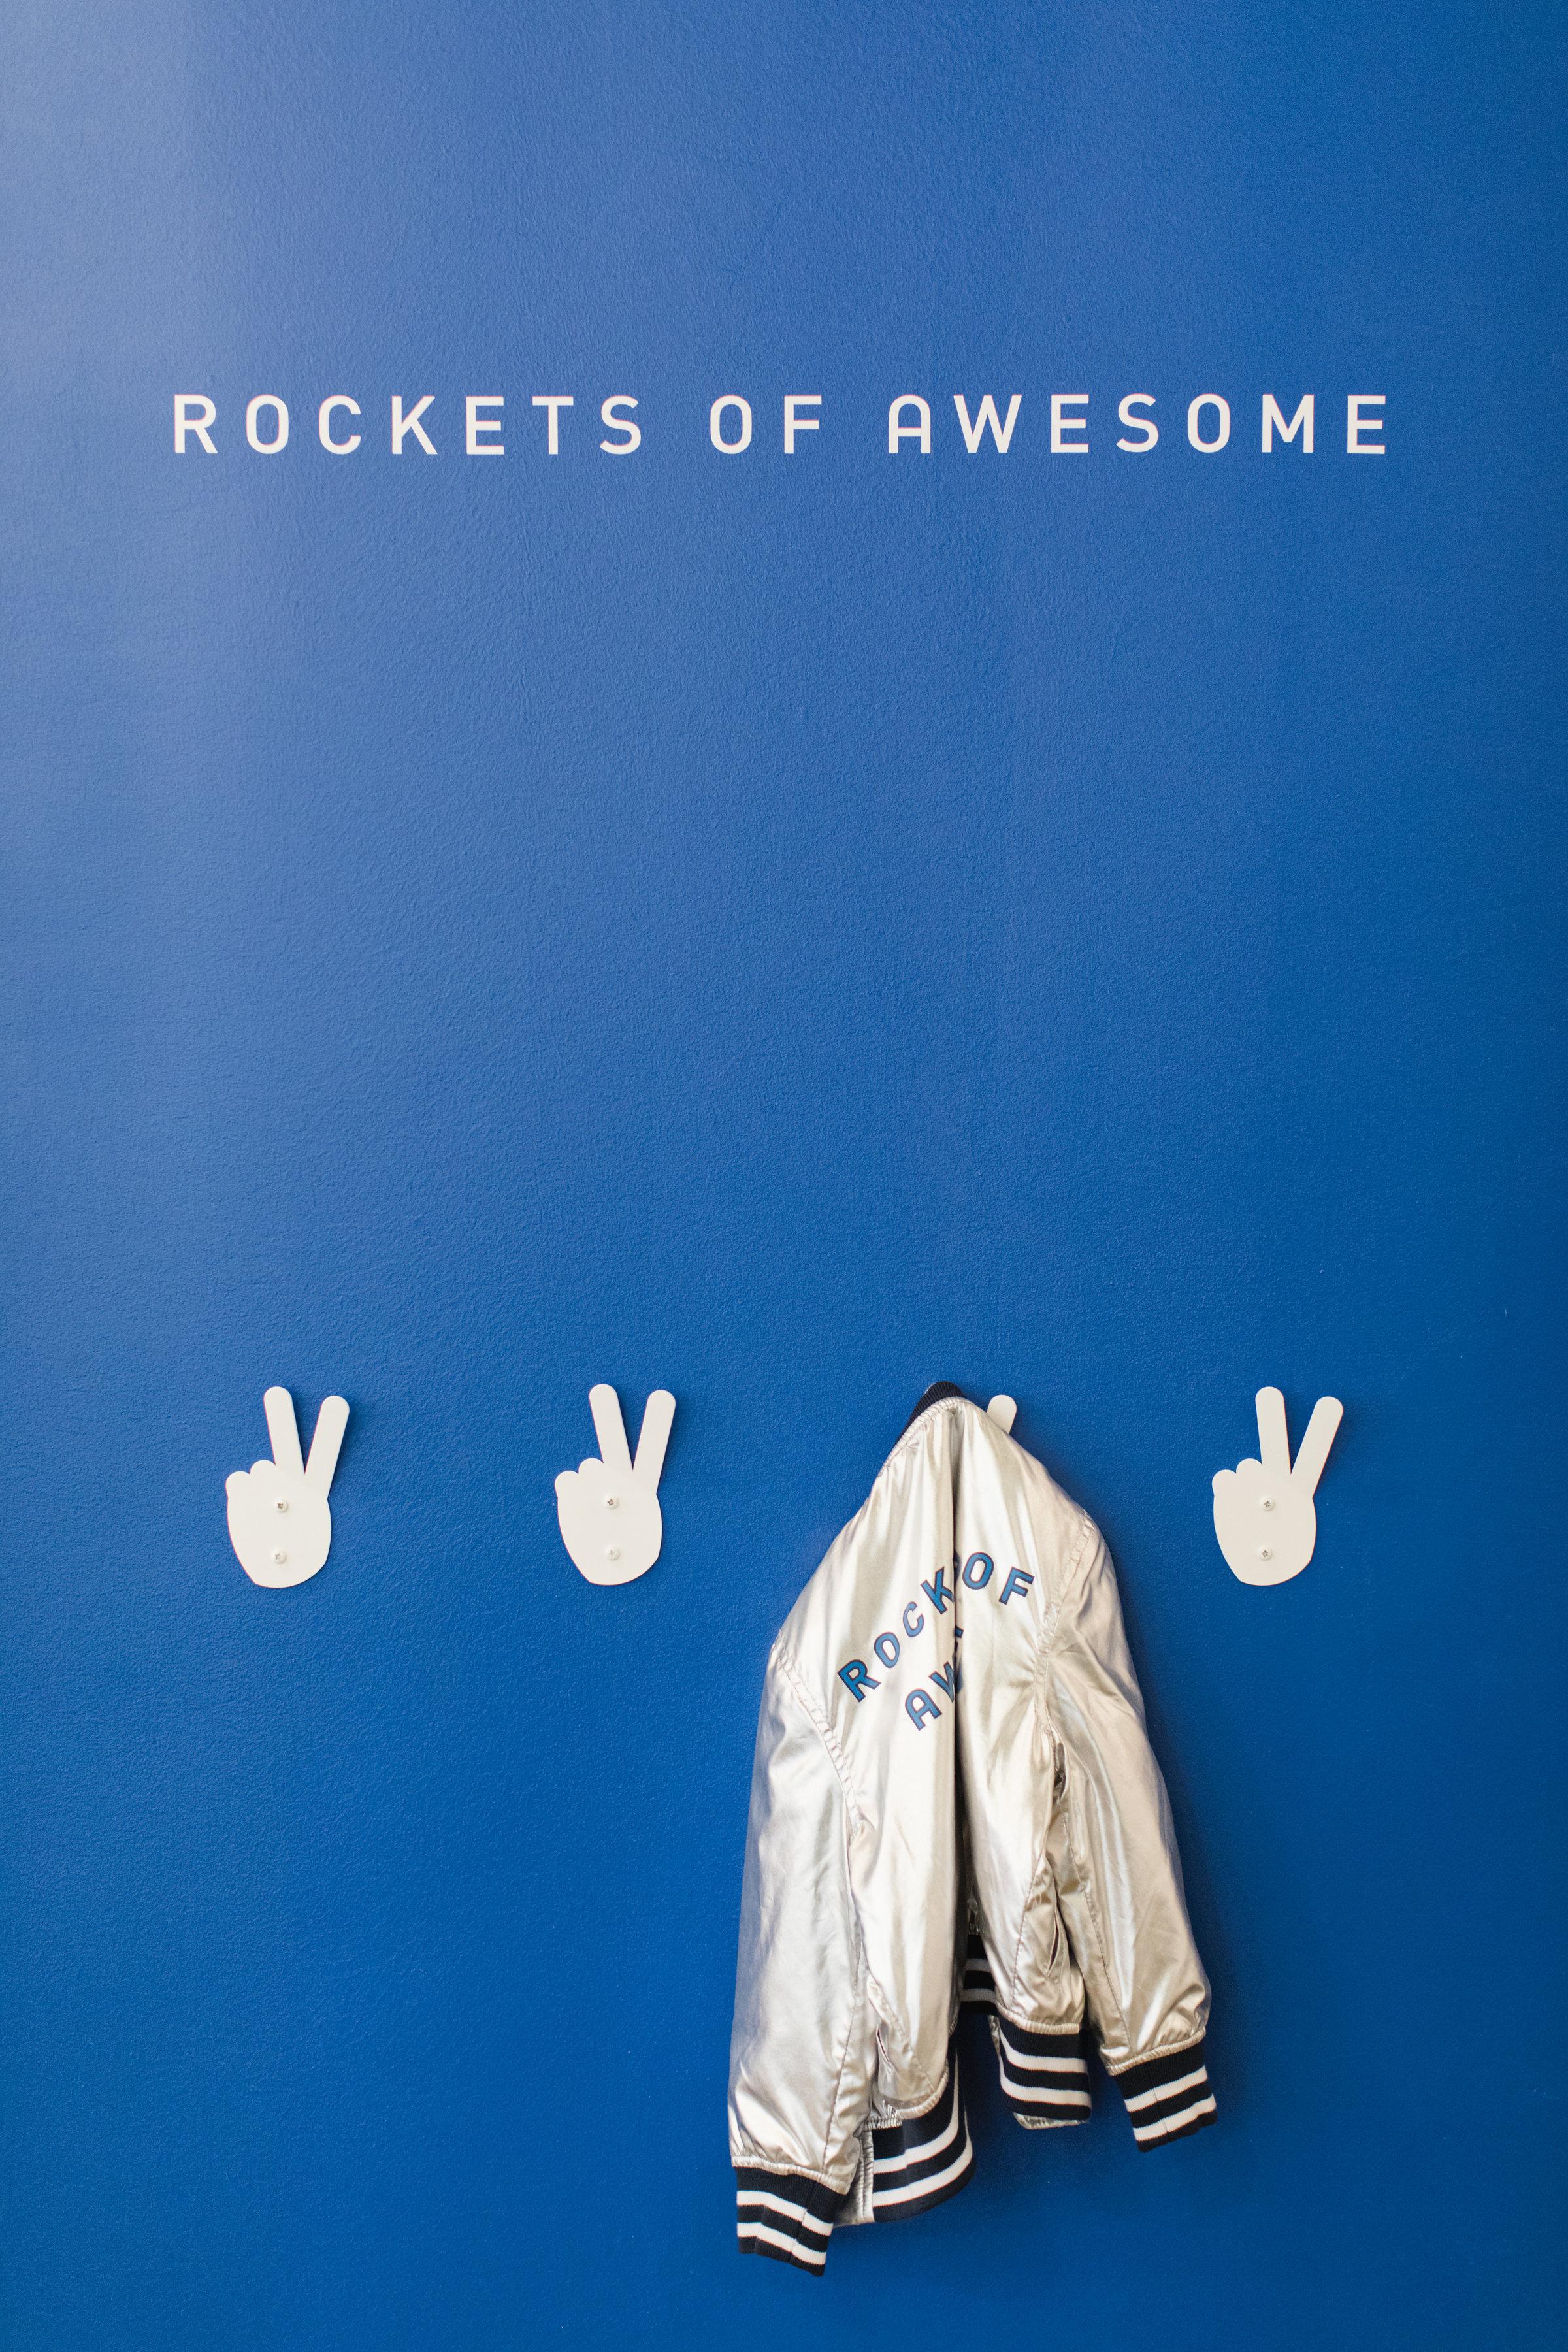 RocketsofAwesome-4 (1).jpg